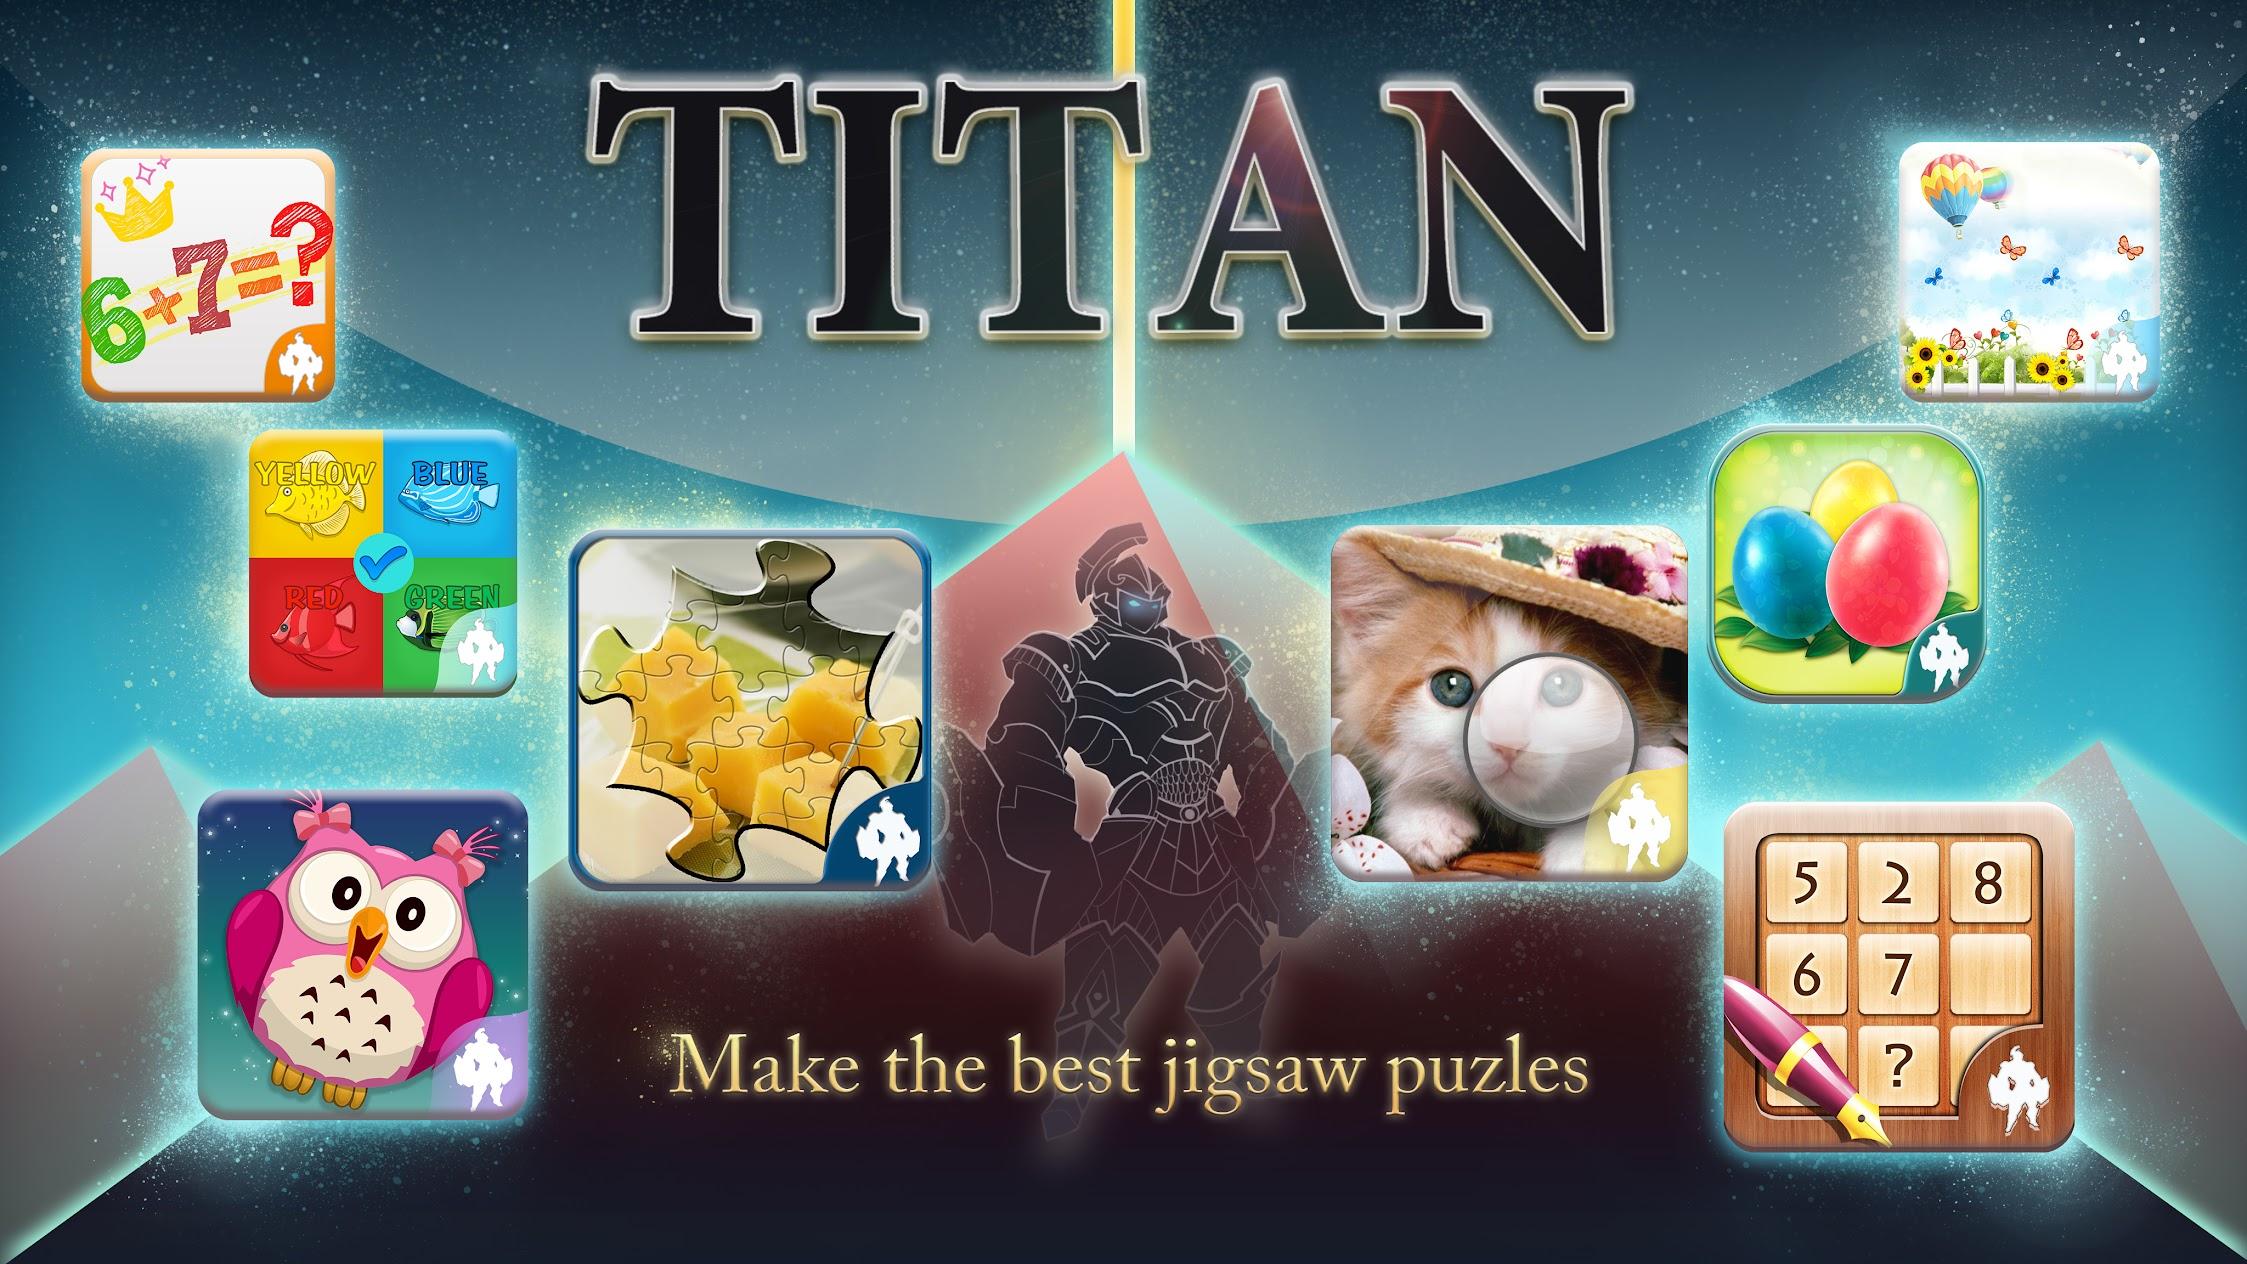 Titan Inc